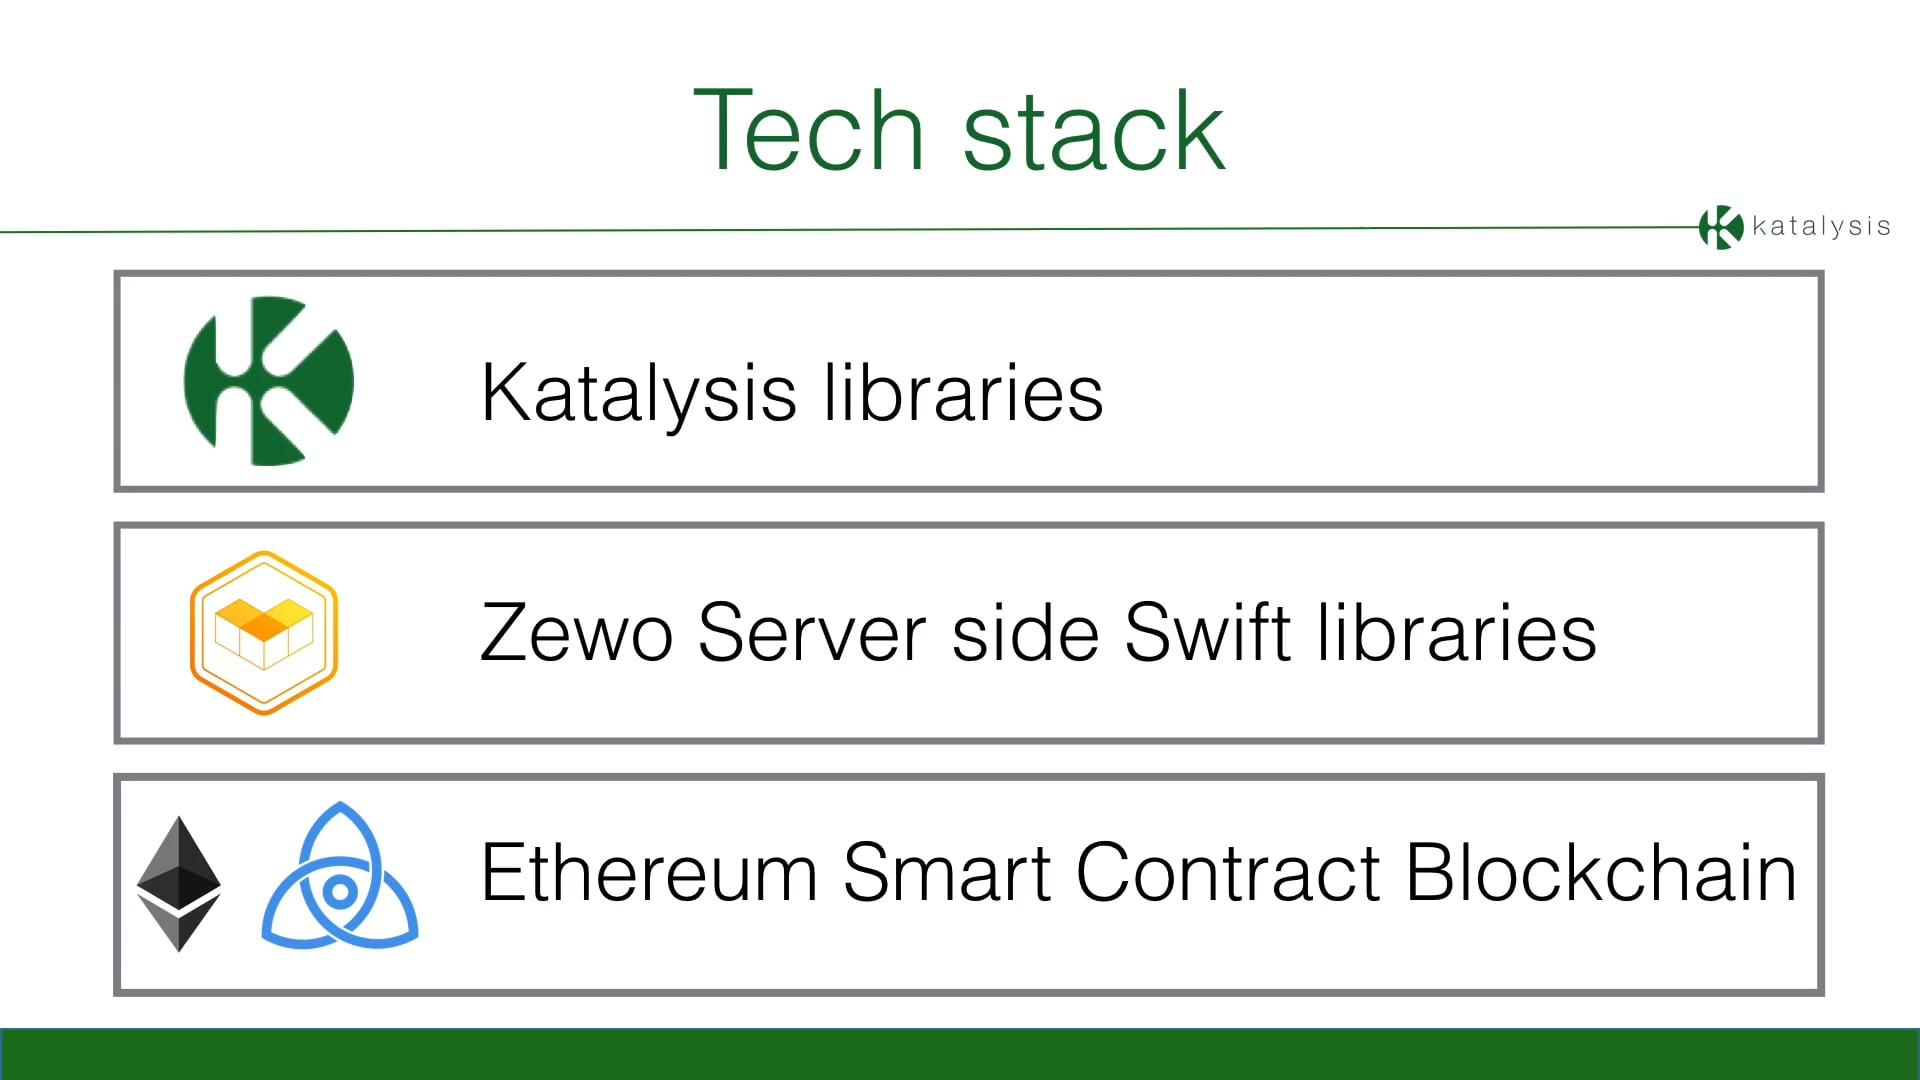 Blockchains & serverside Swift